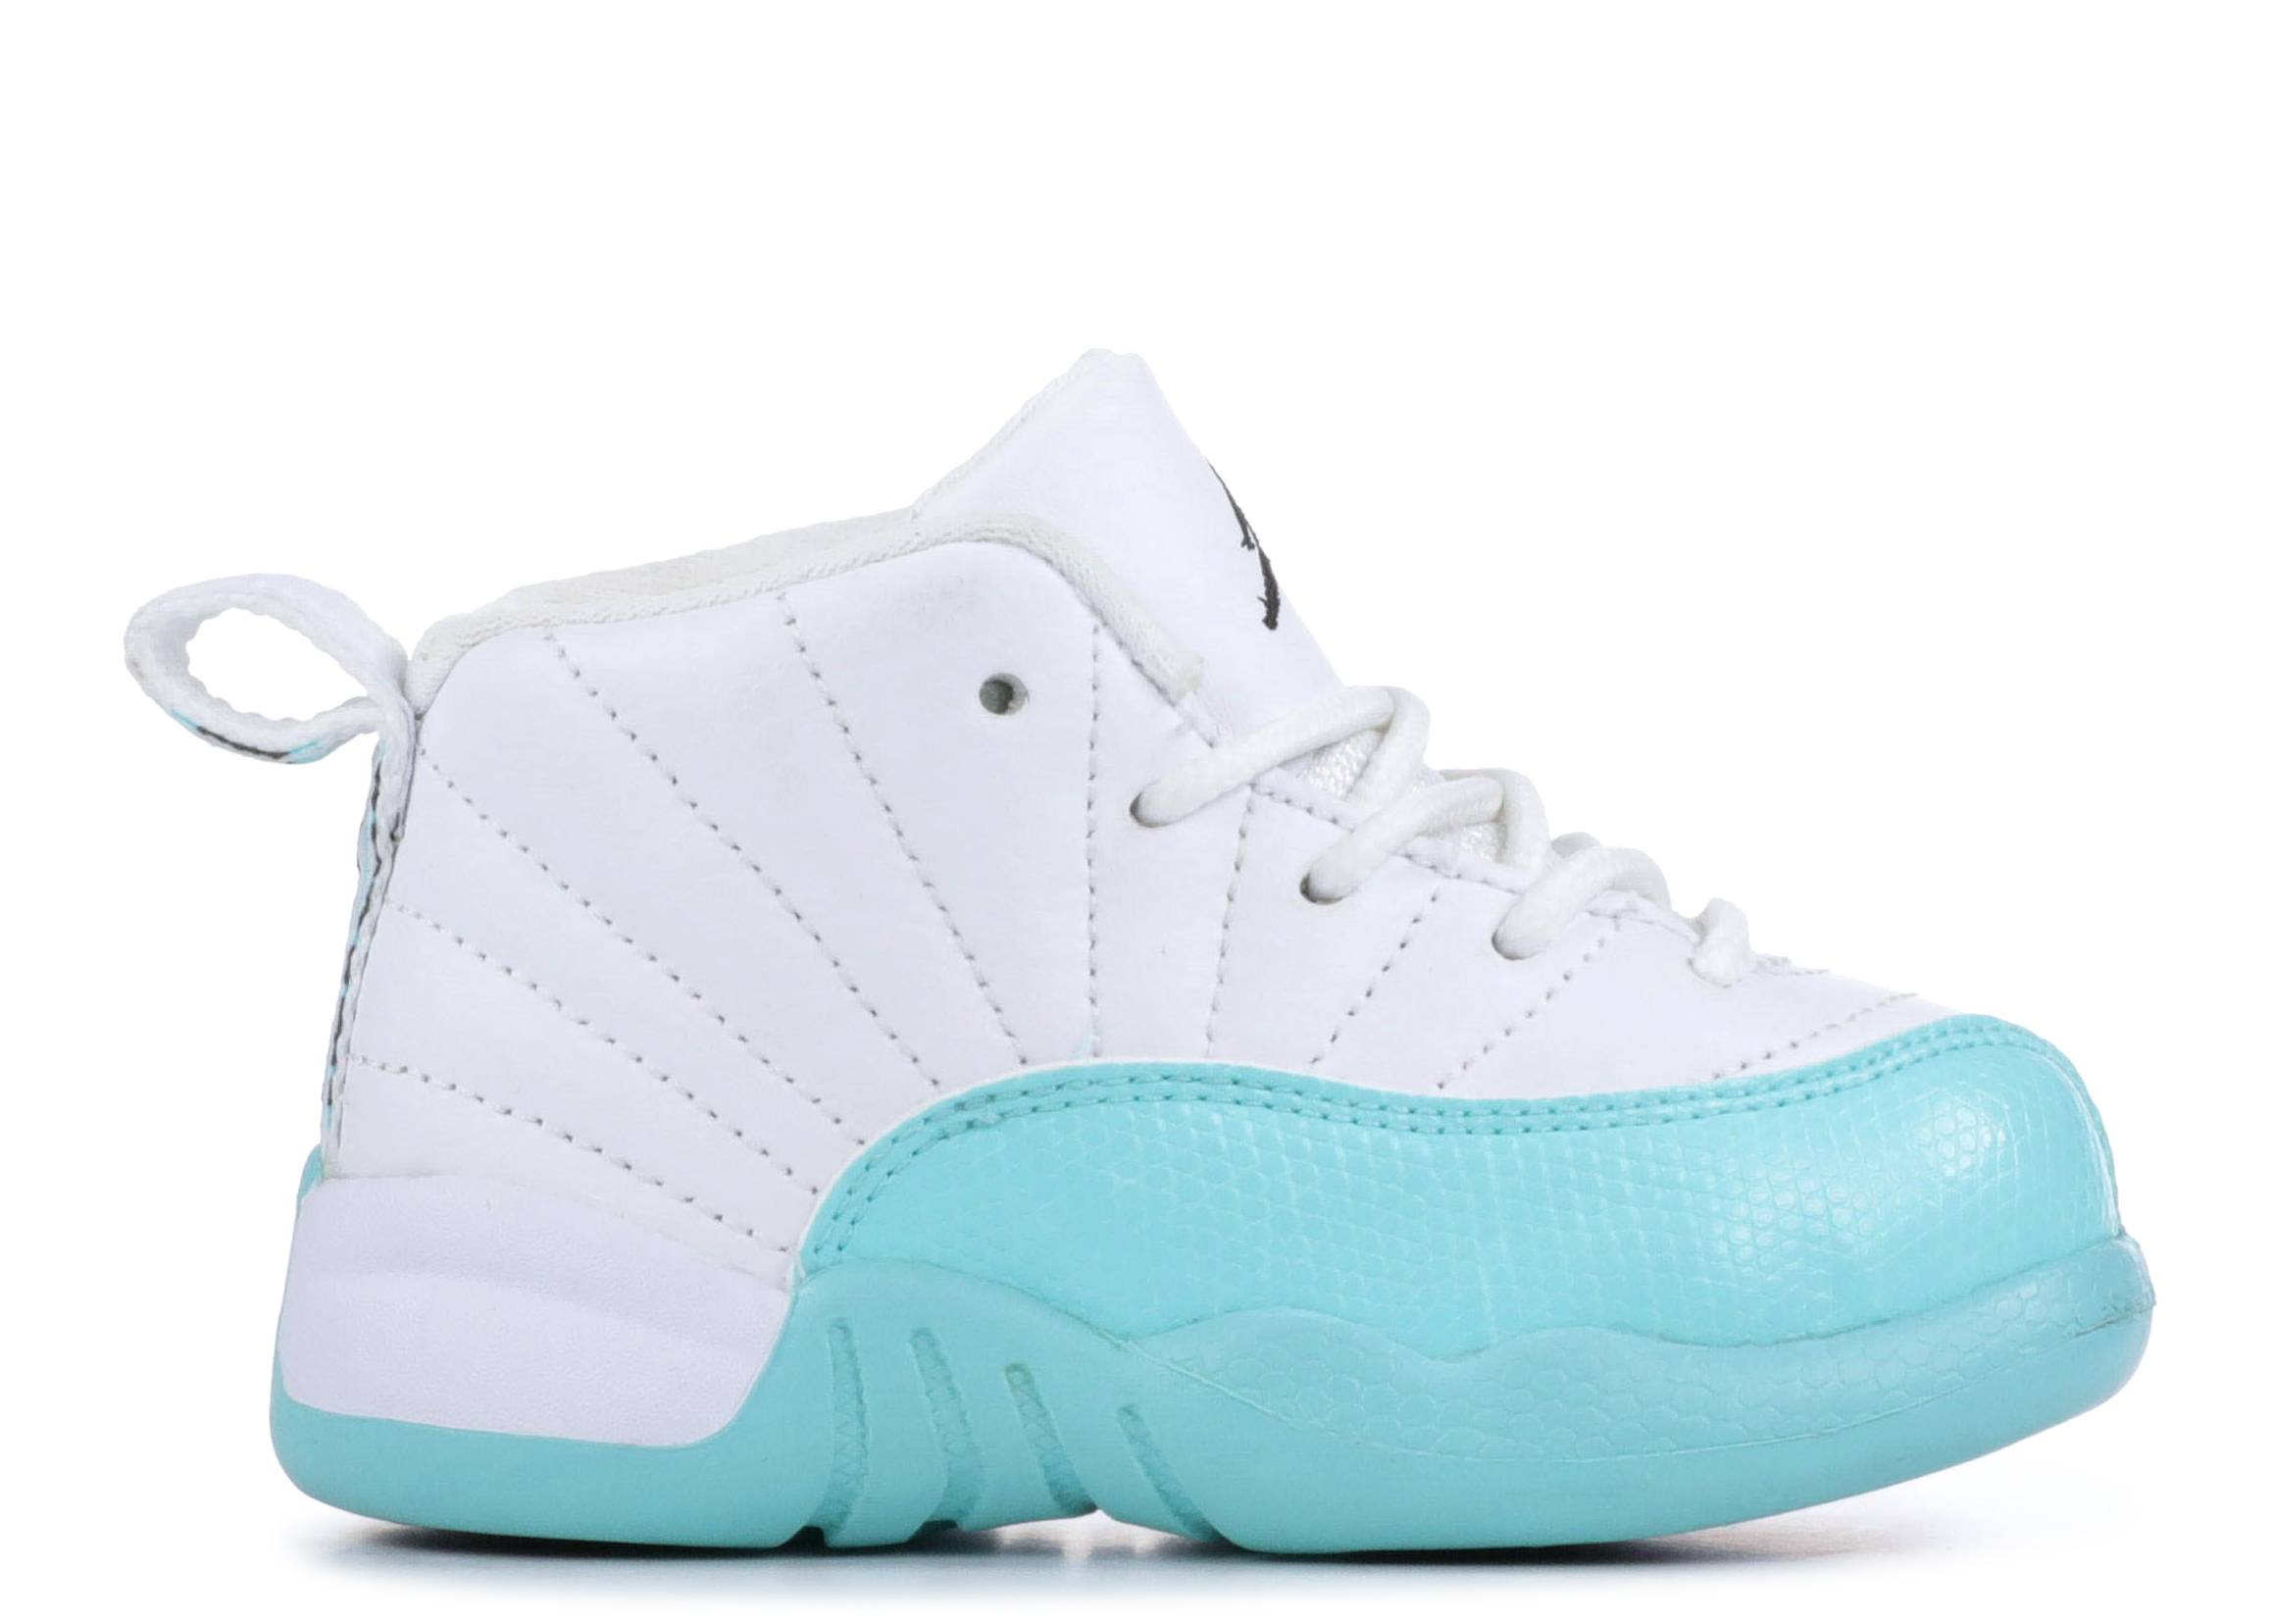 pick up a5929 20c77 Air Jordan 12 (XII) Shoes - Nike | Flight Club